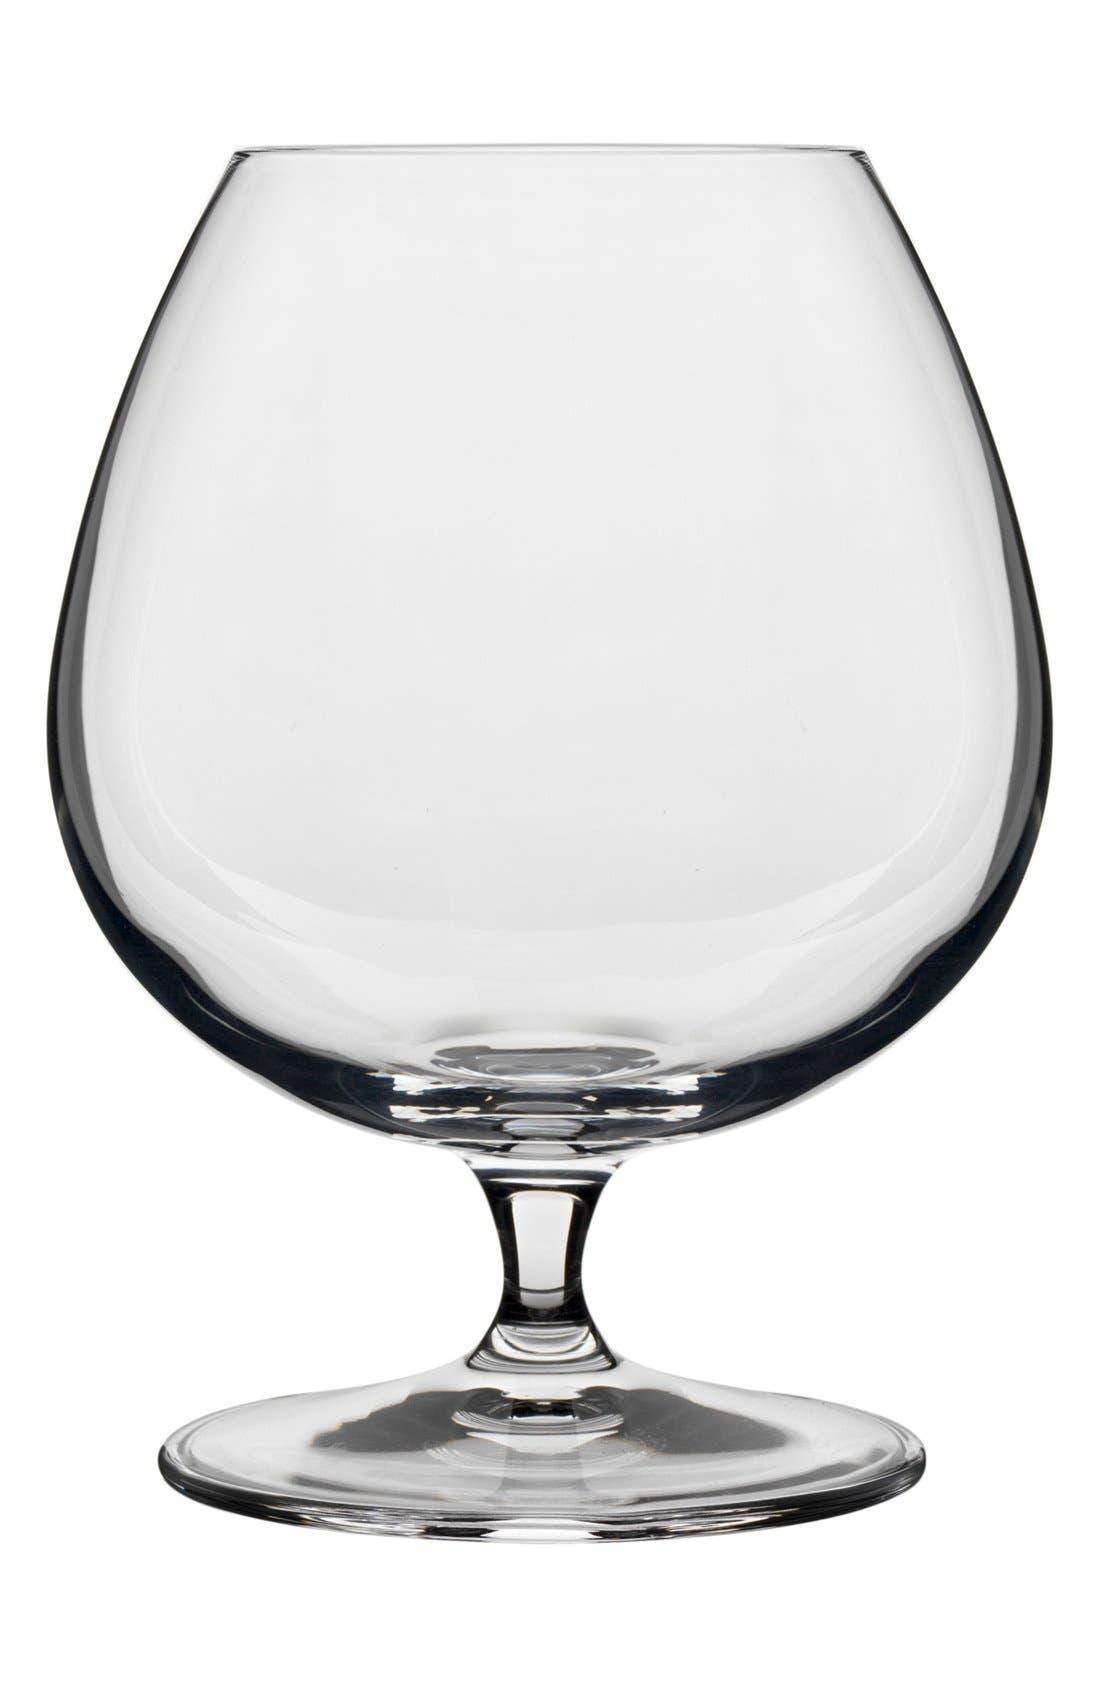 'Crescendo' Cognac Glasses,                             Main thumbnail 1, color,                             000